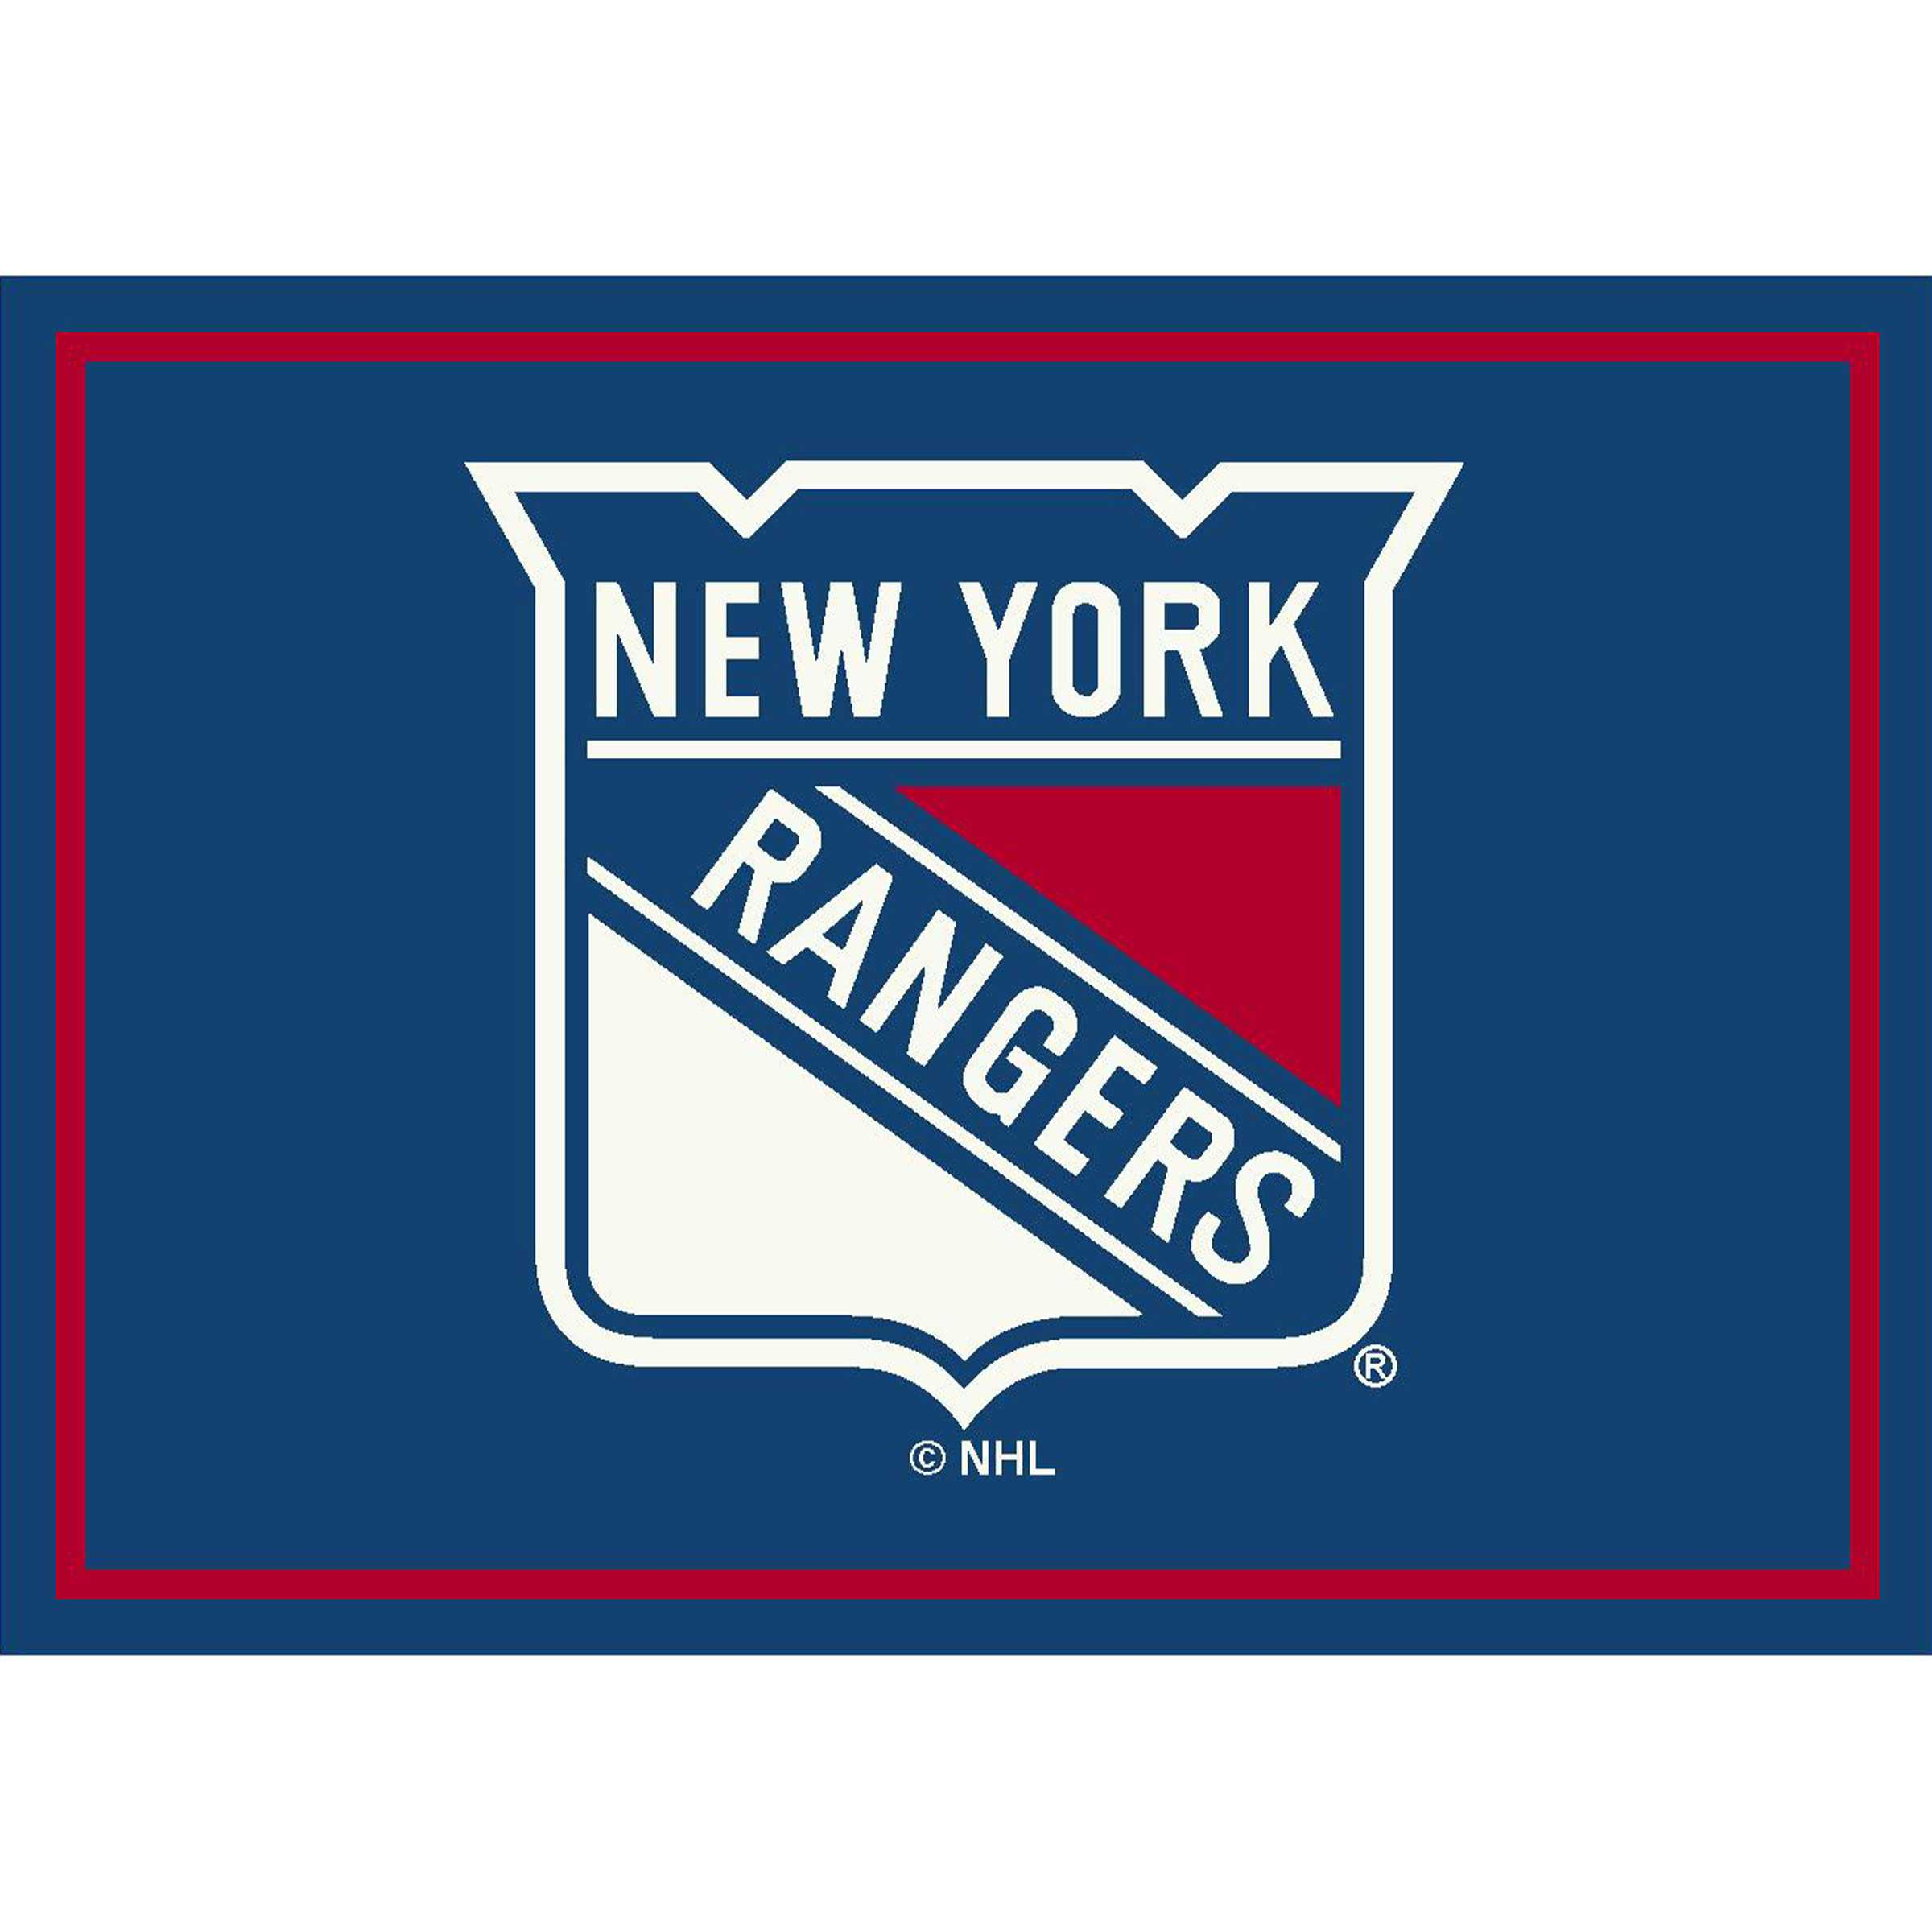 NEW YORK RANGERS 4X6 SPIRIT RUG